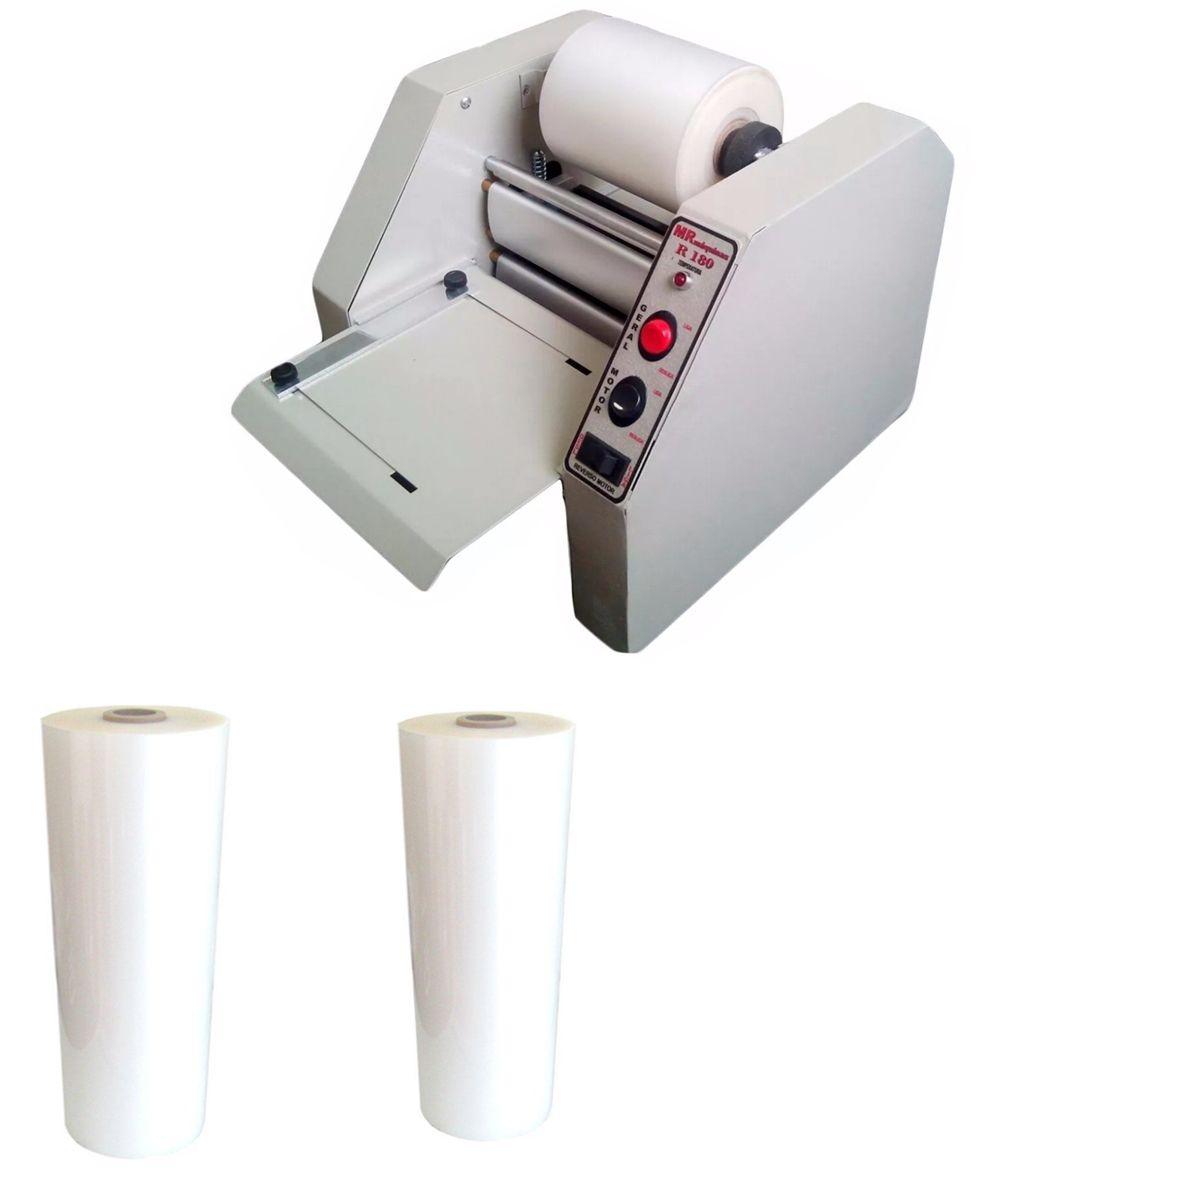 Kit Plastificadora Profissional R-180 + 2 Bobinas (RG)